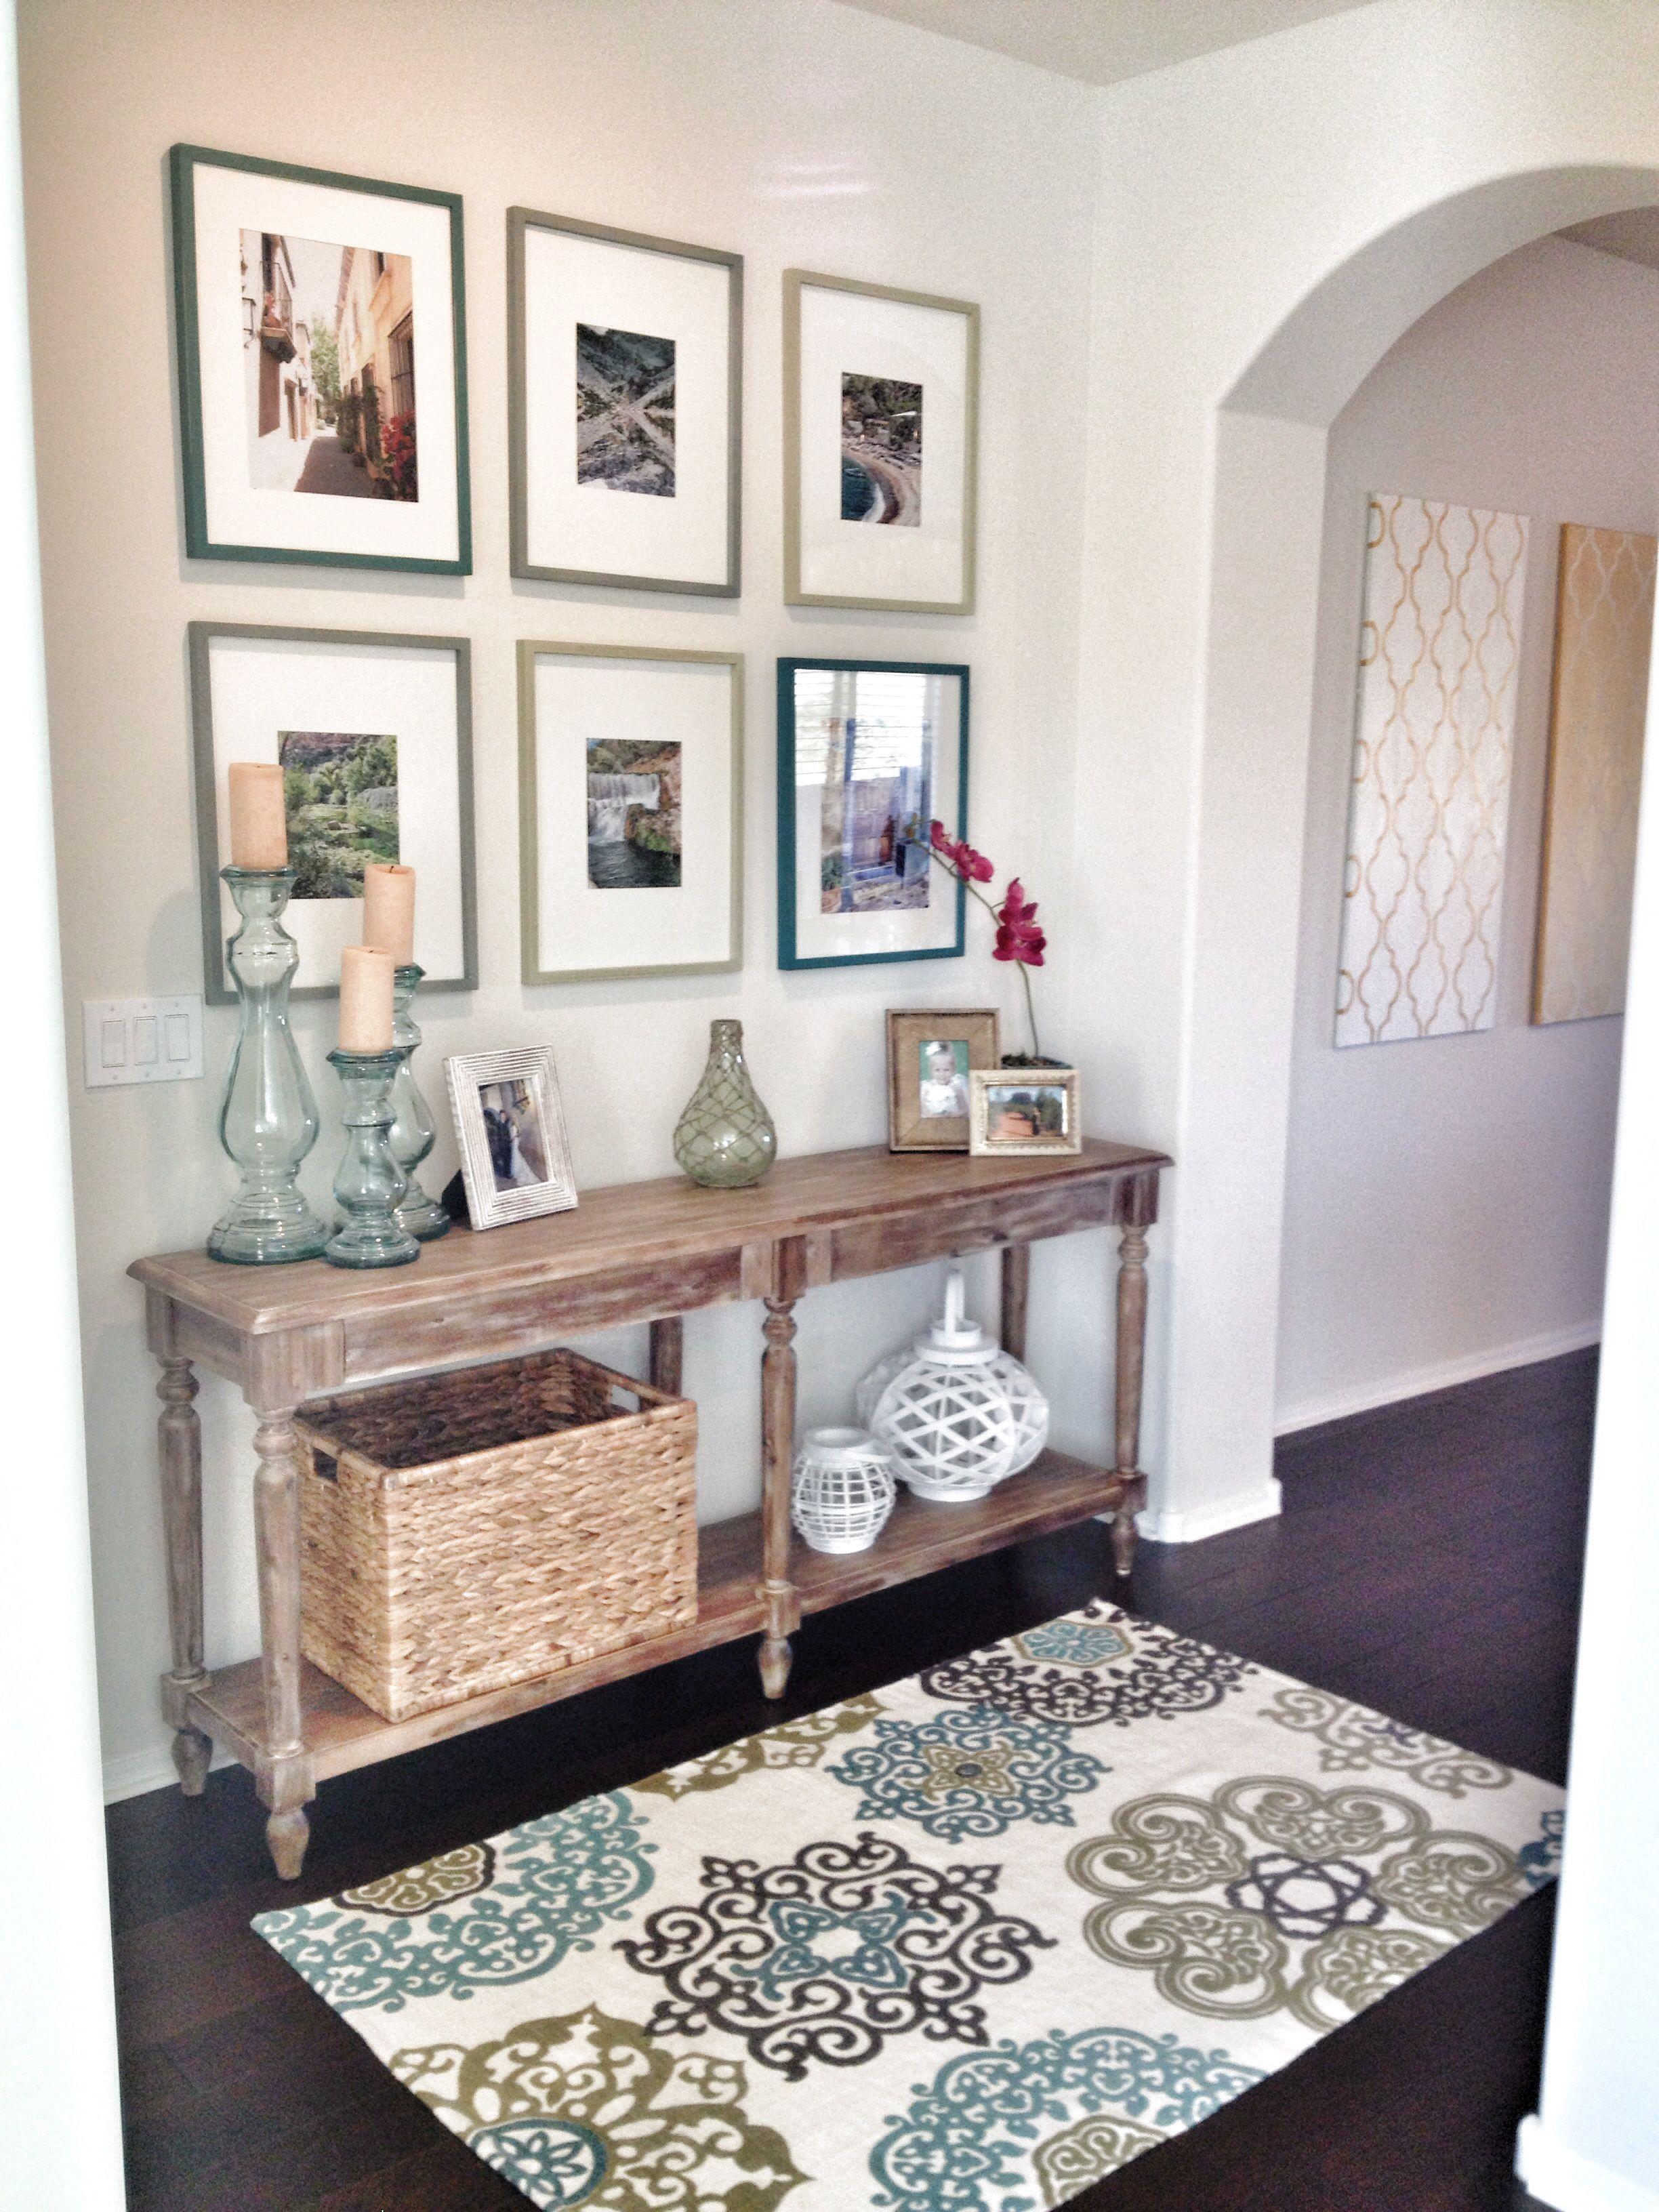 Cheap Hall Table 10 recibidores con encanto propio | tj max, walls and foyers